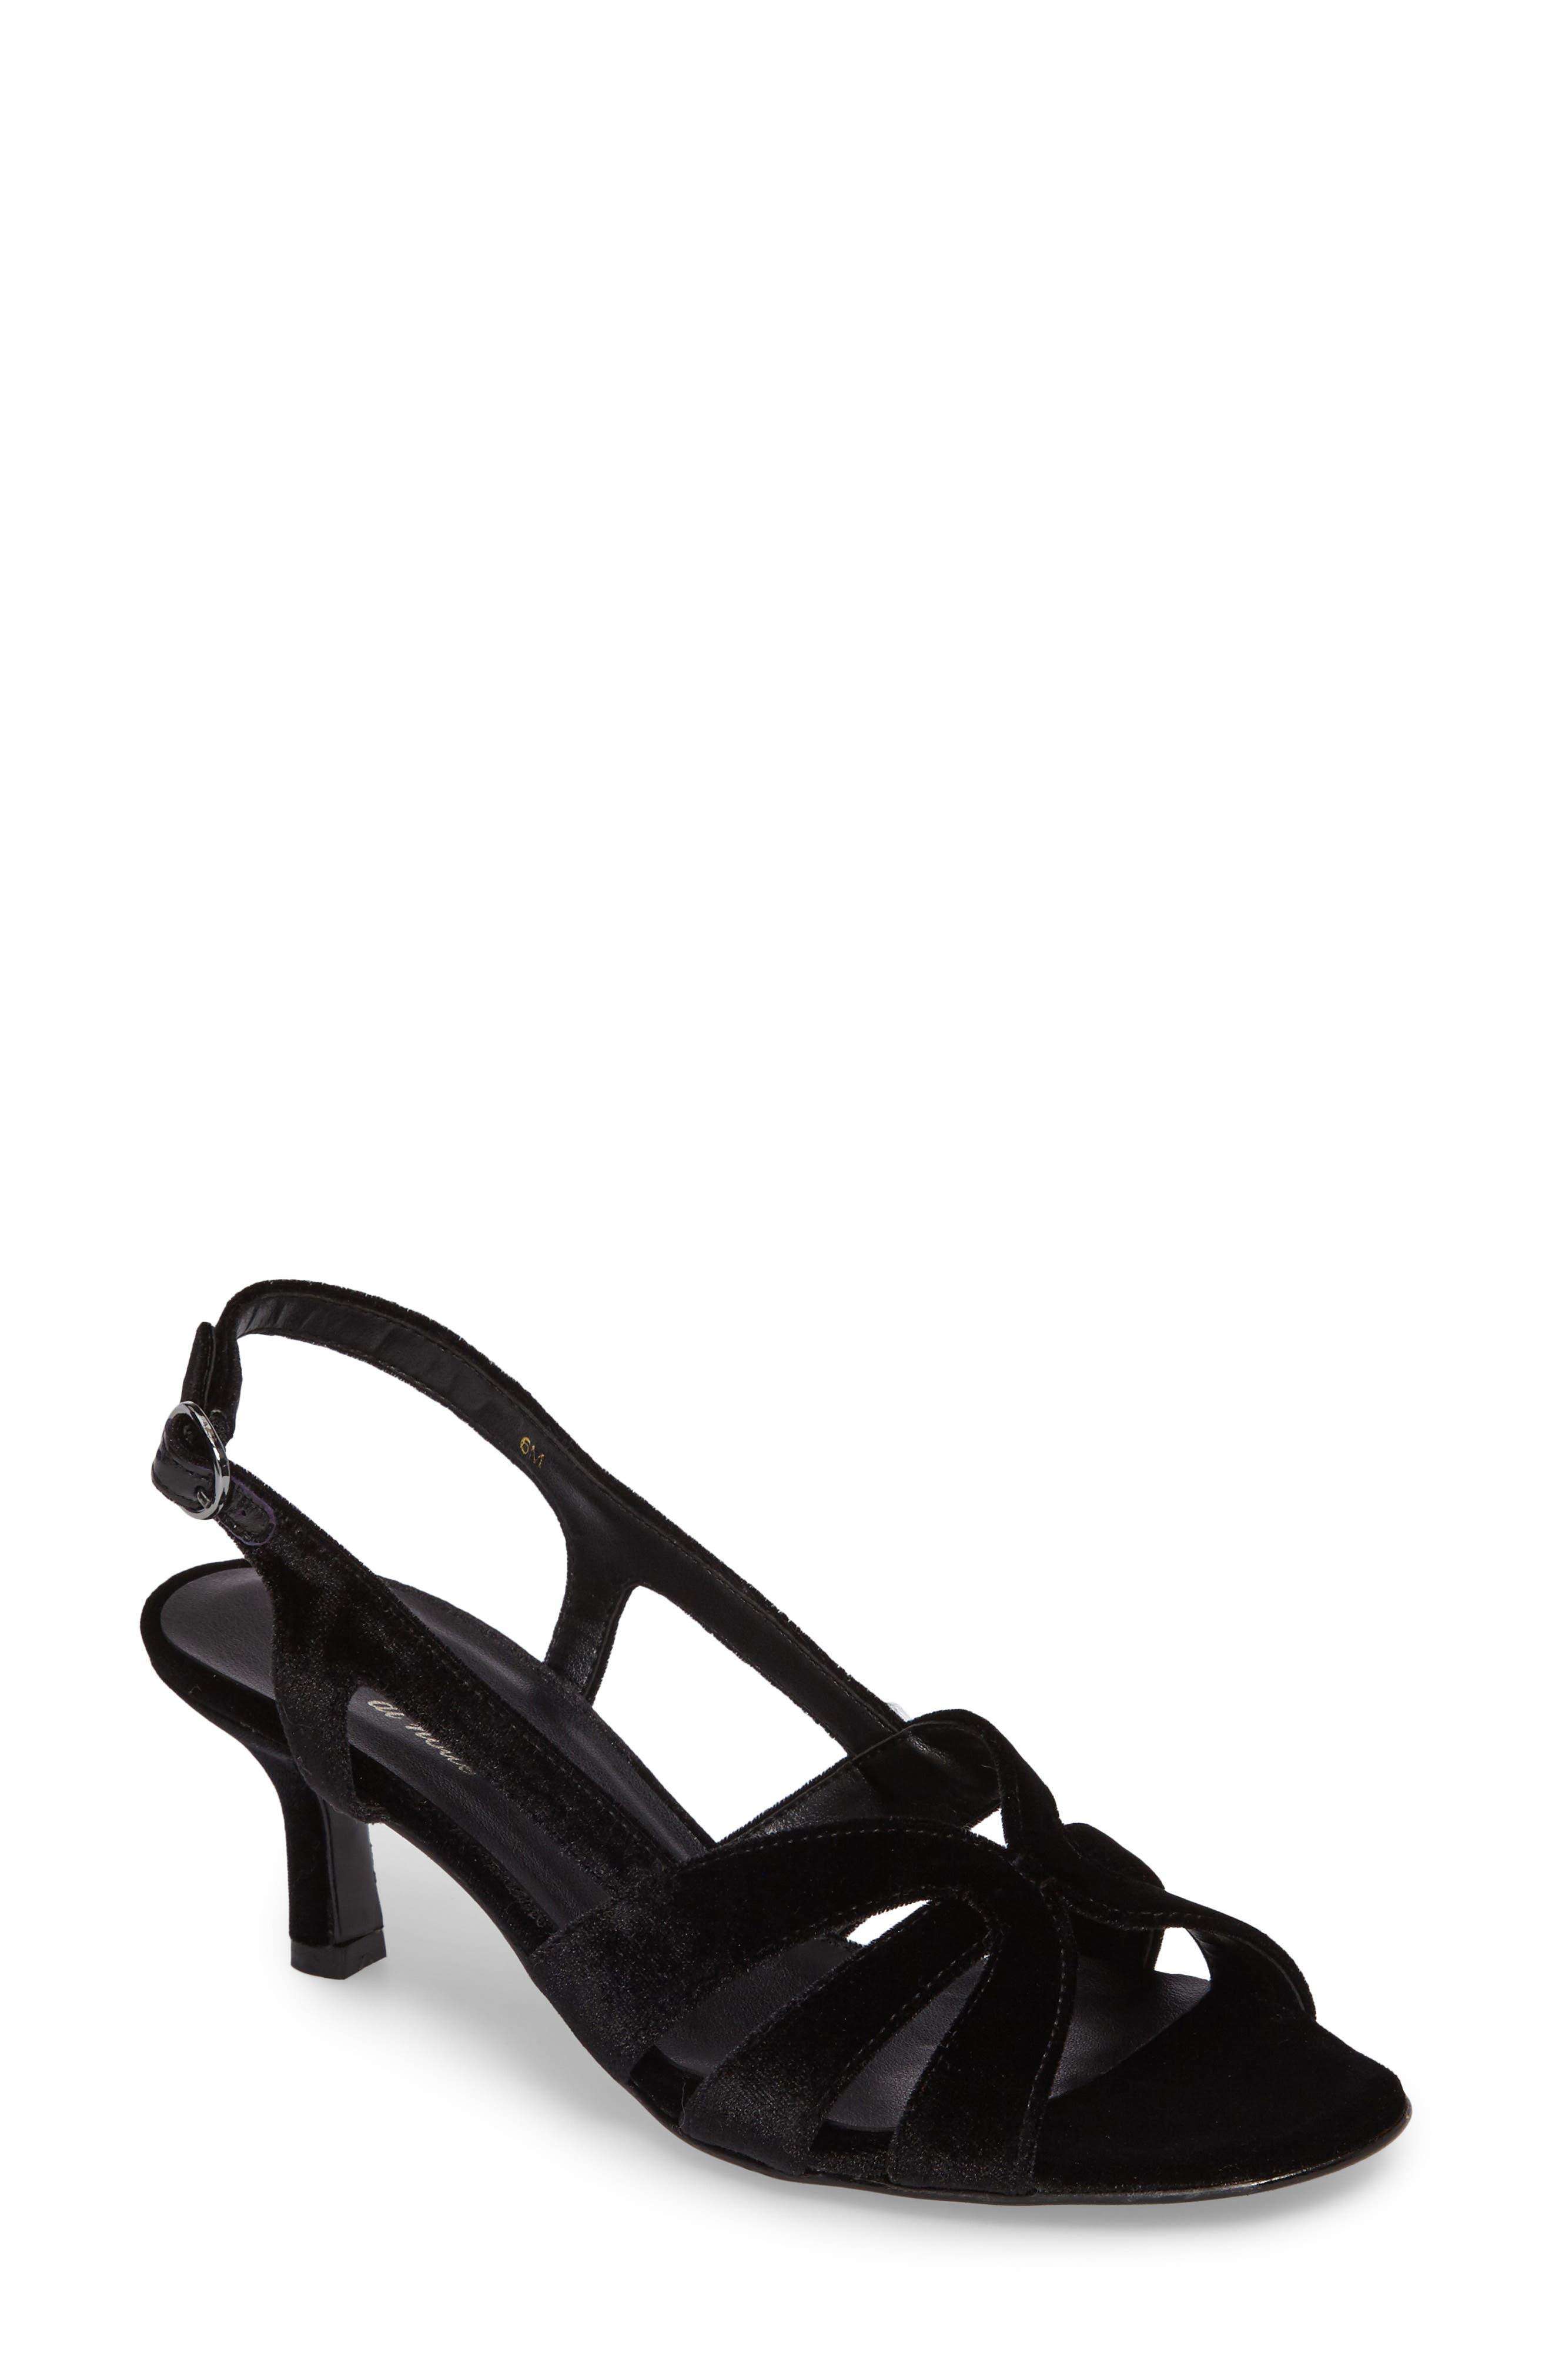 Maeve Slingback Sandal,                         Main,                         color, 001